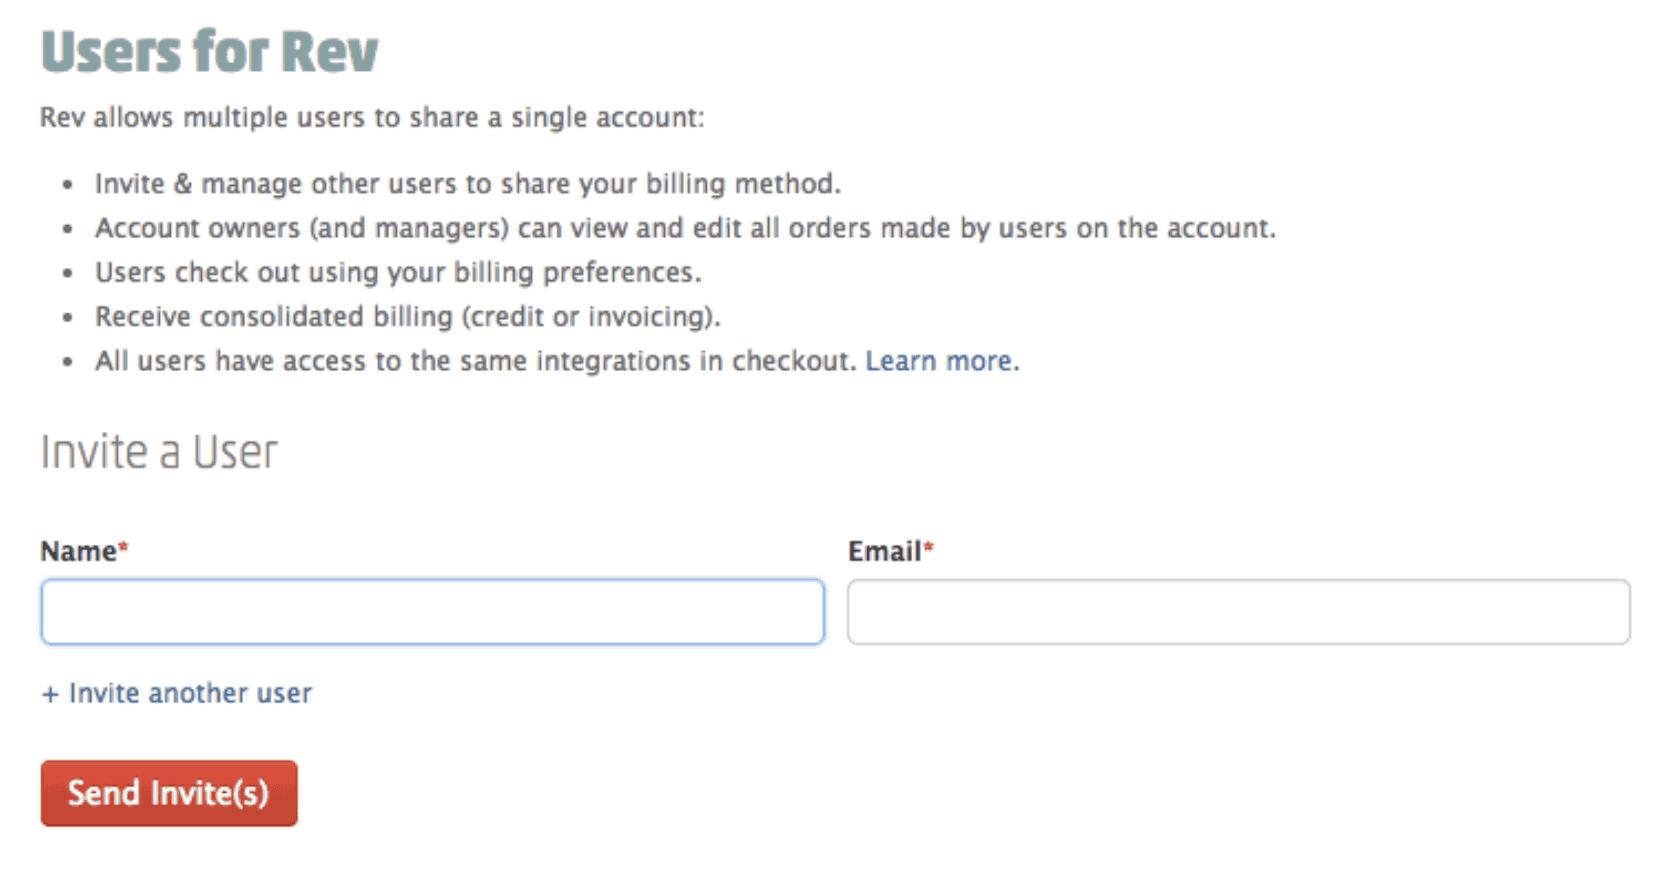 Invite users to Rev Account